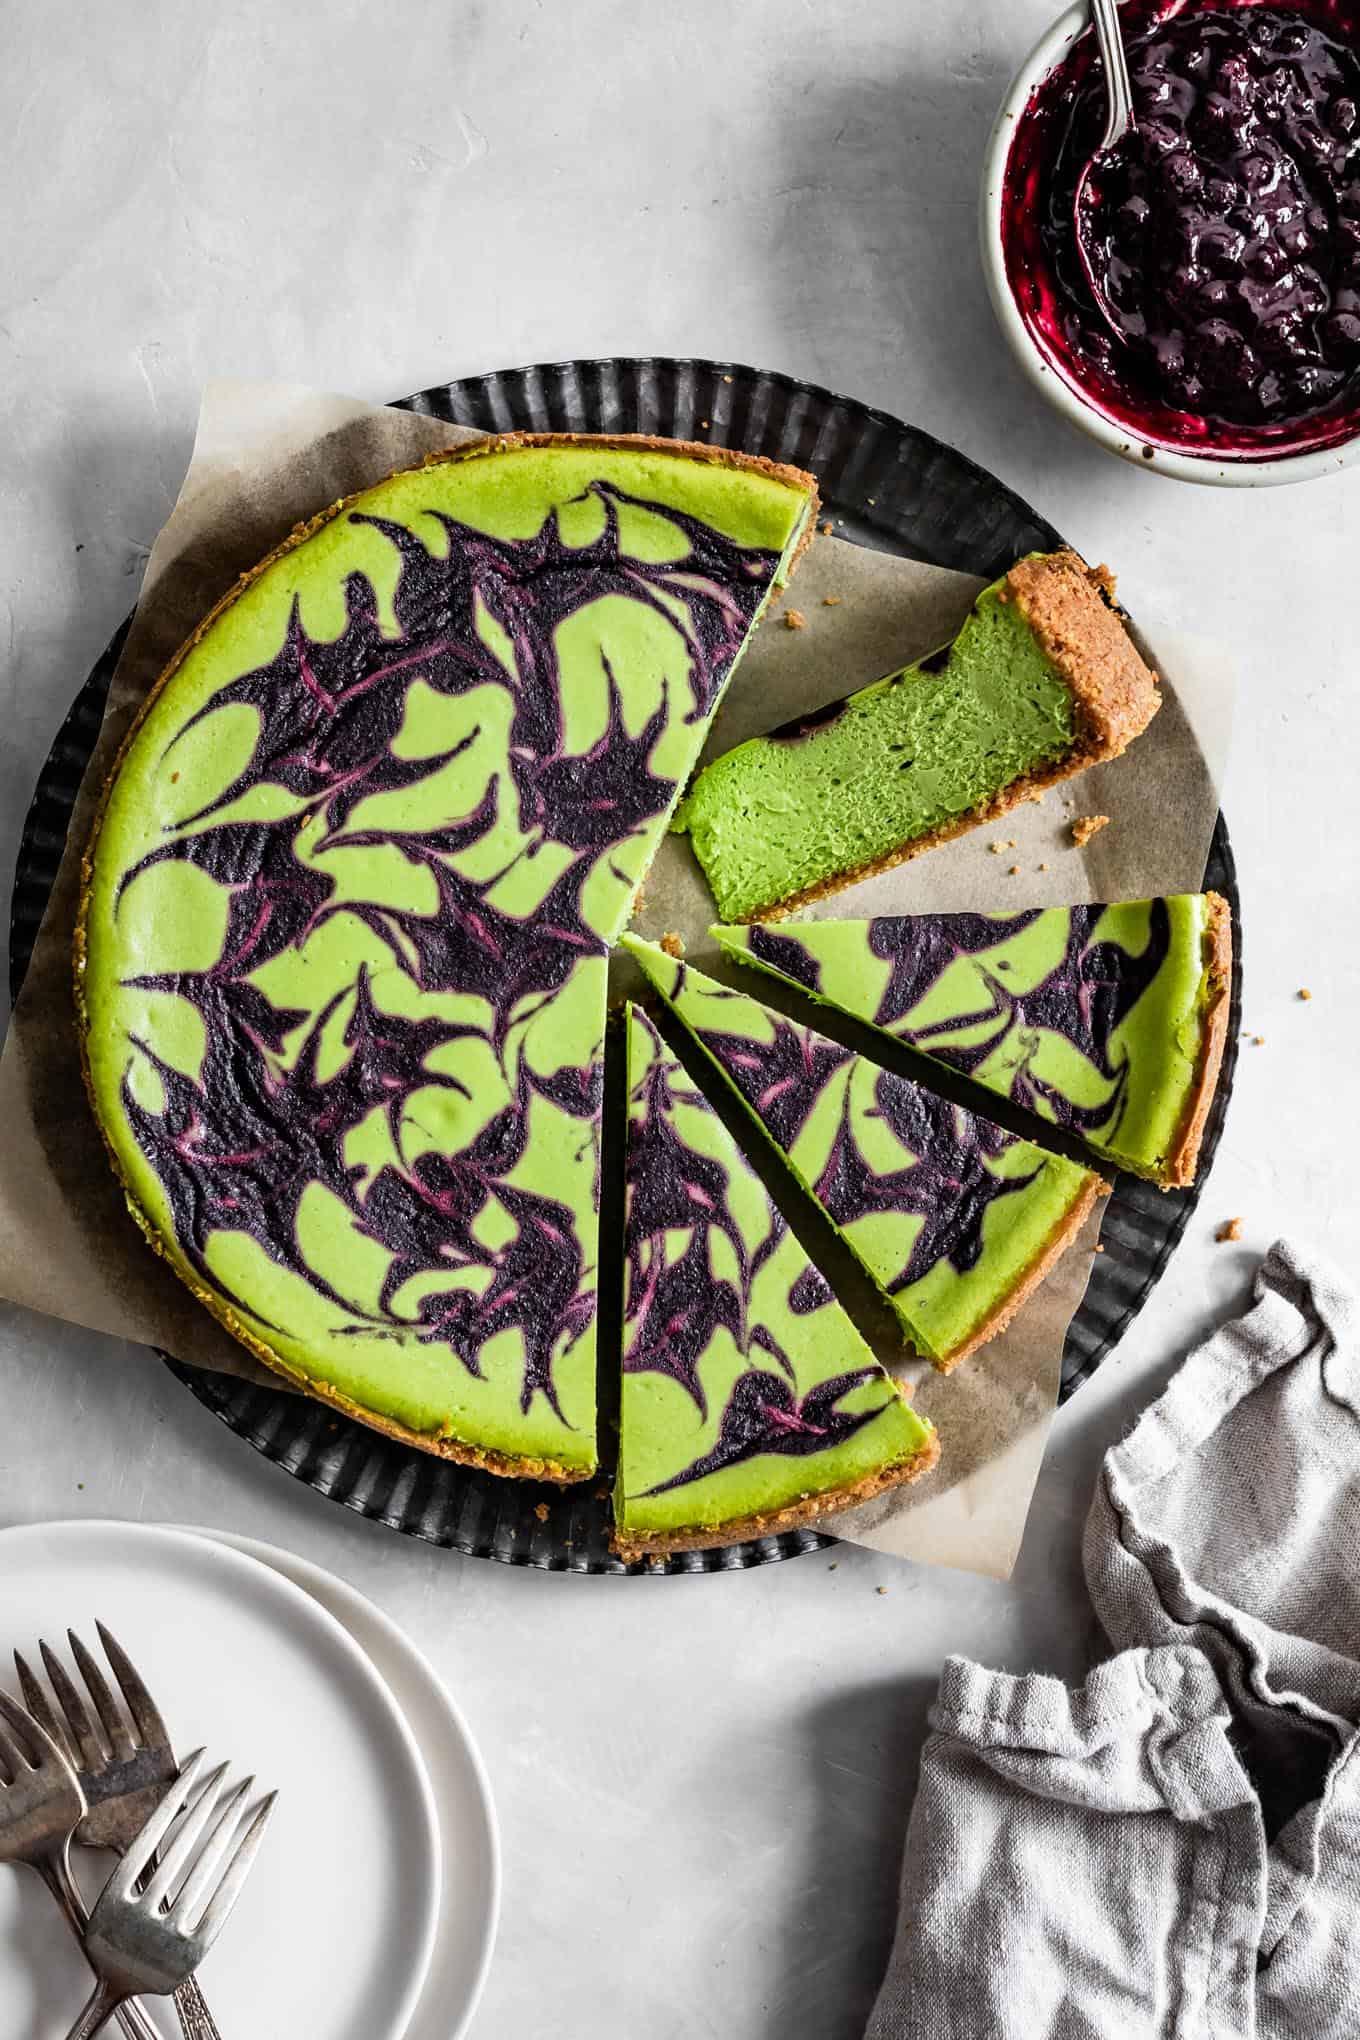 Baked Gluten-Free Matcha Cheesecake with Berry Swirl